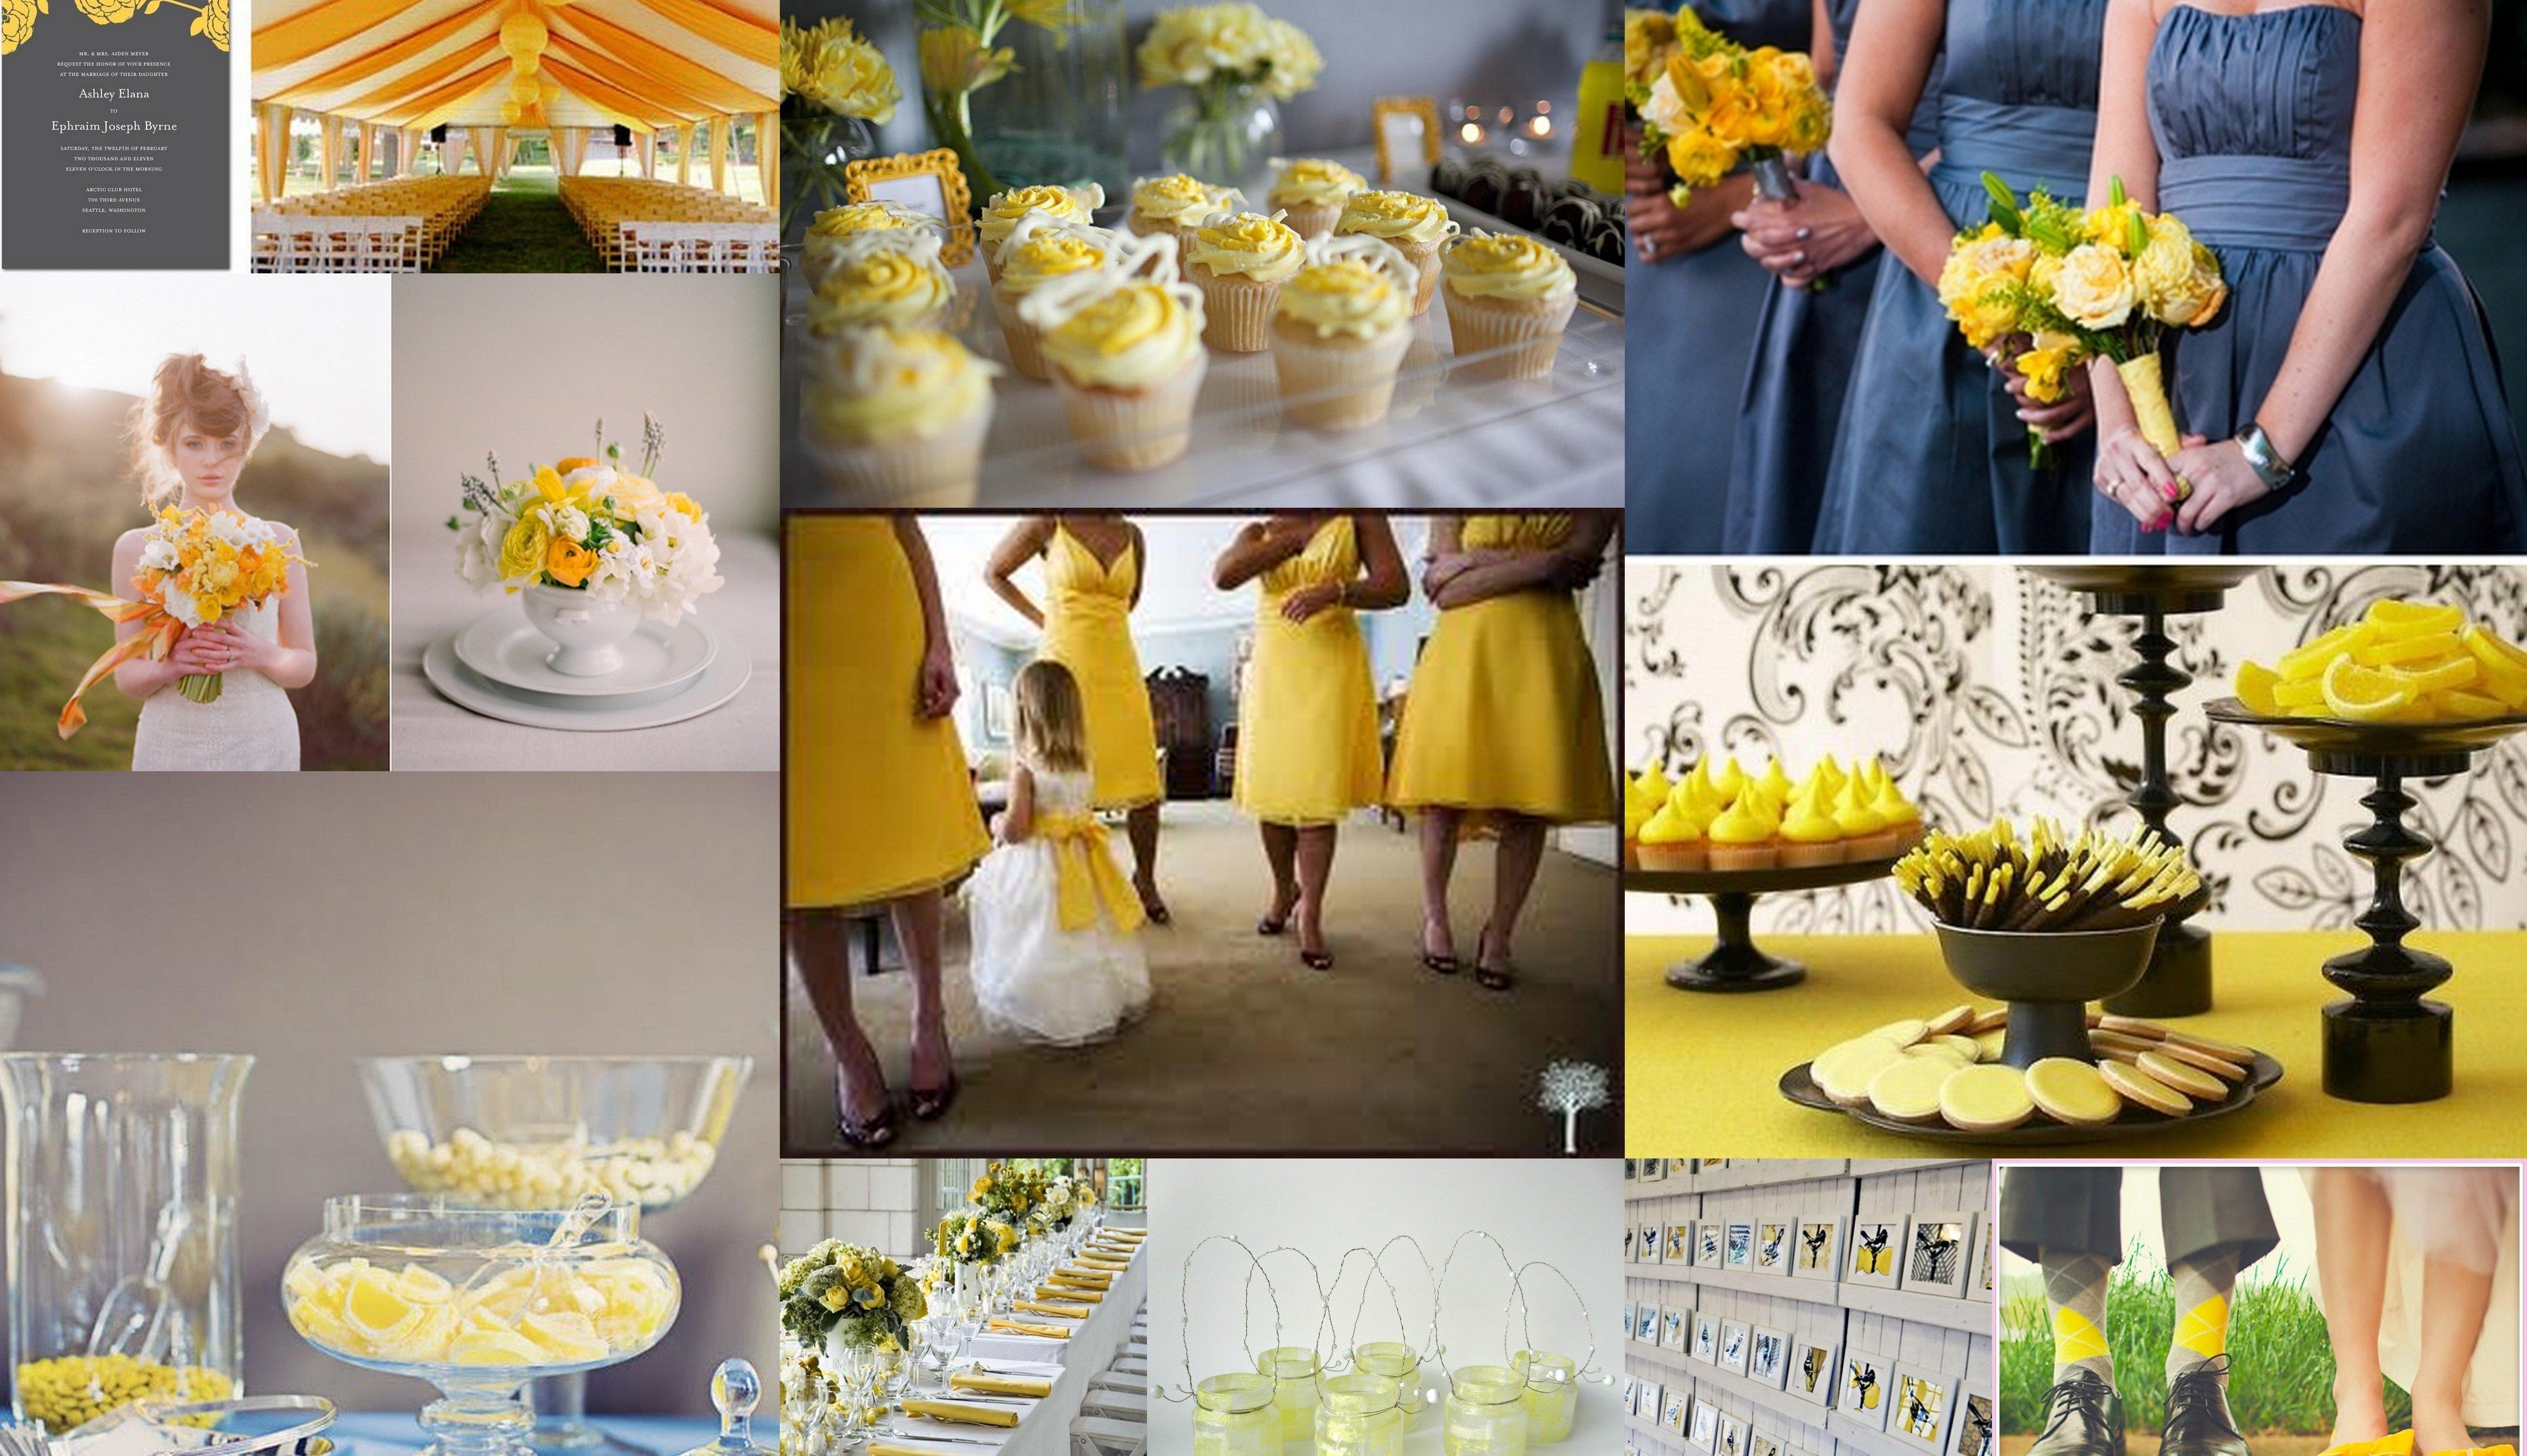 10 Gorgeous Navy Blue And Yellow Wedding Ideas blue yellow wedding decorationdeasyellow anddeas navy eilag